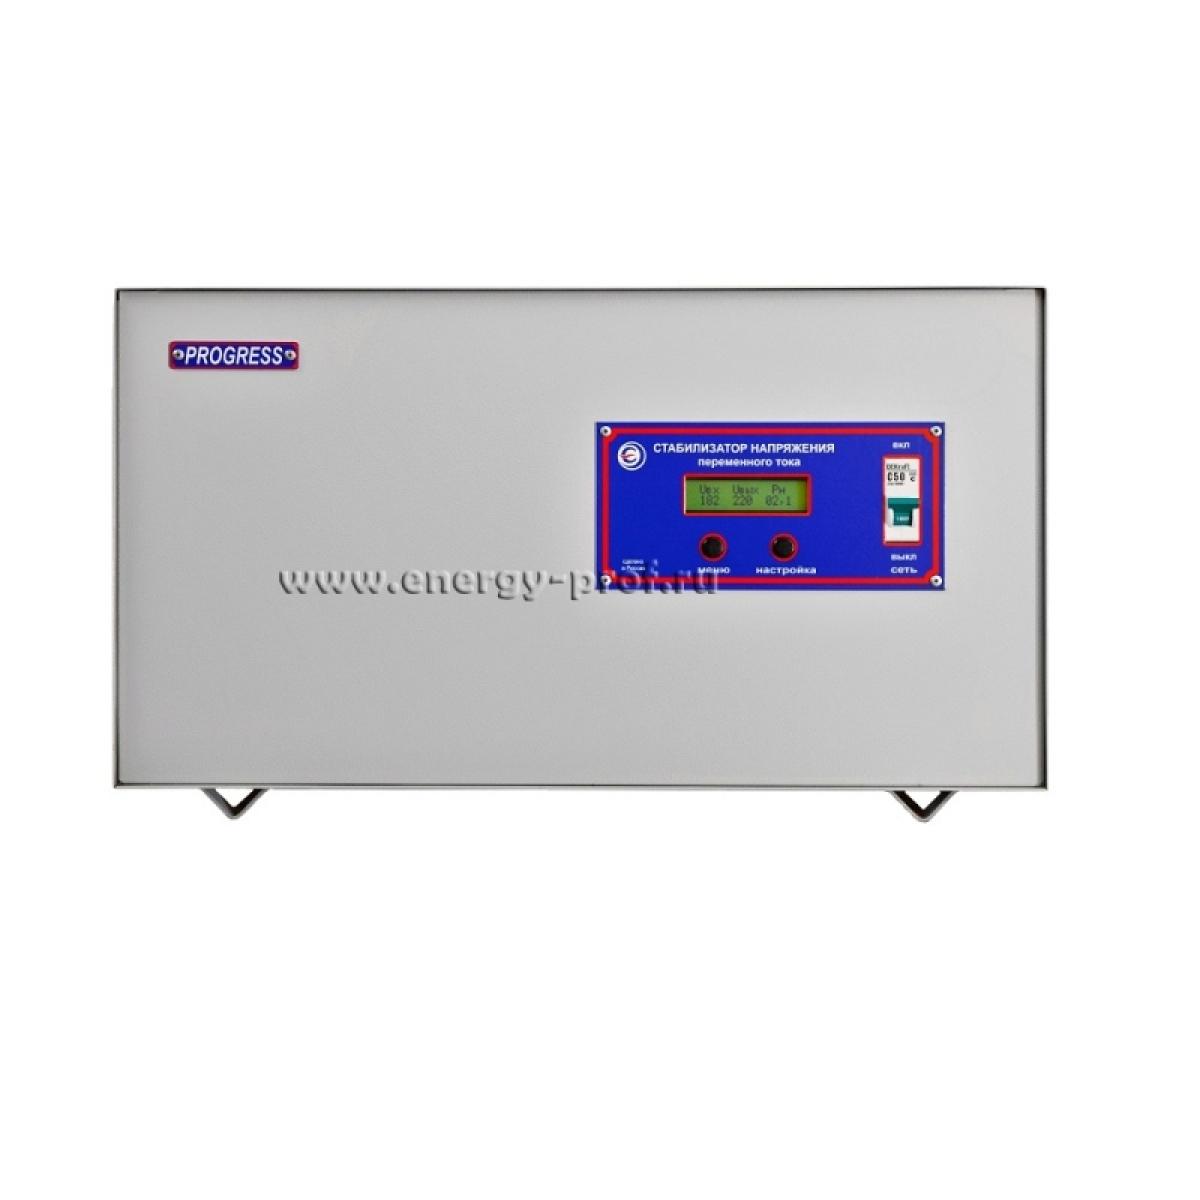 Однофазный стабилизатор PROGRESS 5000L, вид спереди